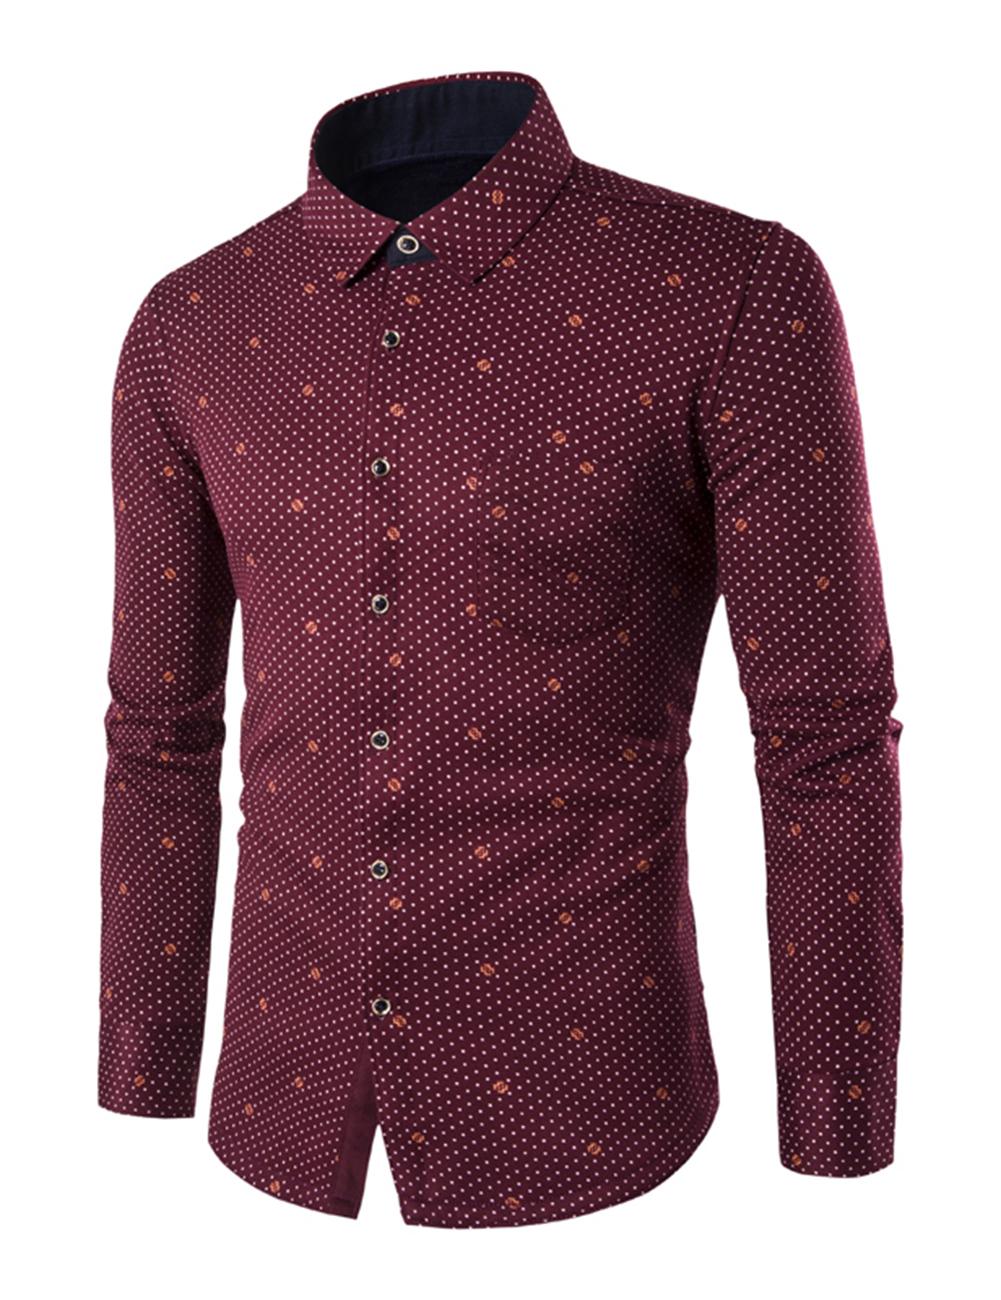 Us men 39 s fall winter warm fleece lining dress shirt casual for Mens warm flannel shirts